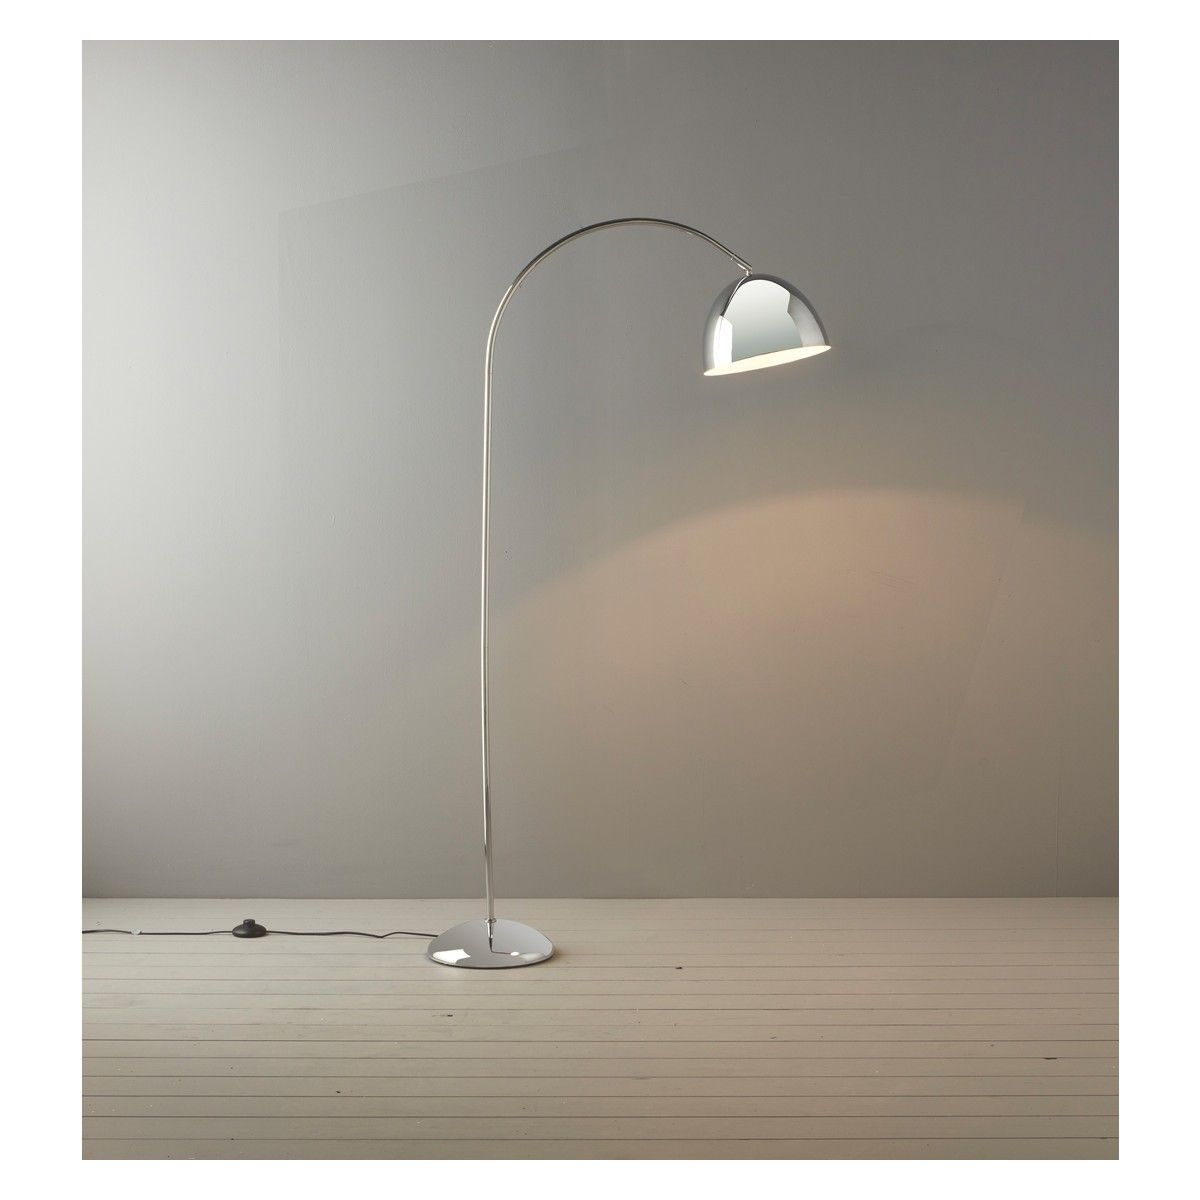 Hardy Hardy Chrome Metal Overreach Floor Lamp Buy Now At Habitat Uk Floor Lamp Lamp Flooring